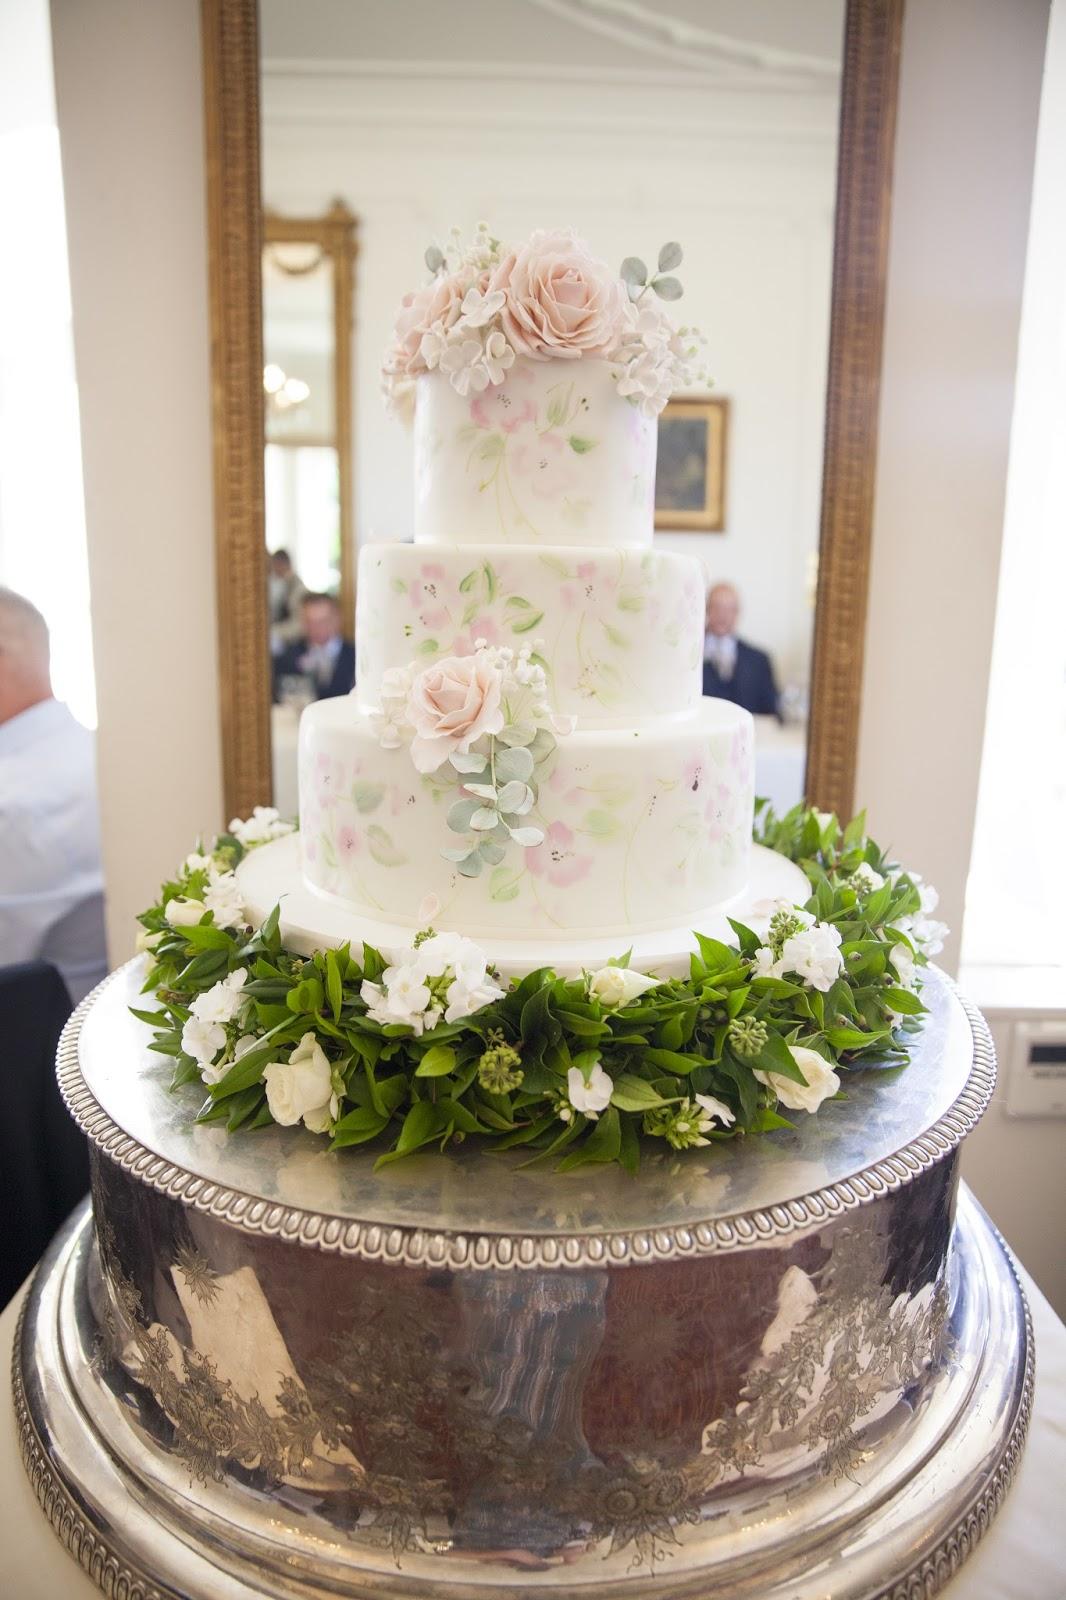 Cake server for wedding